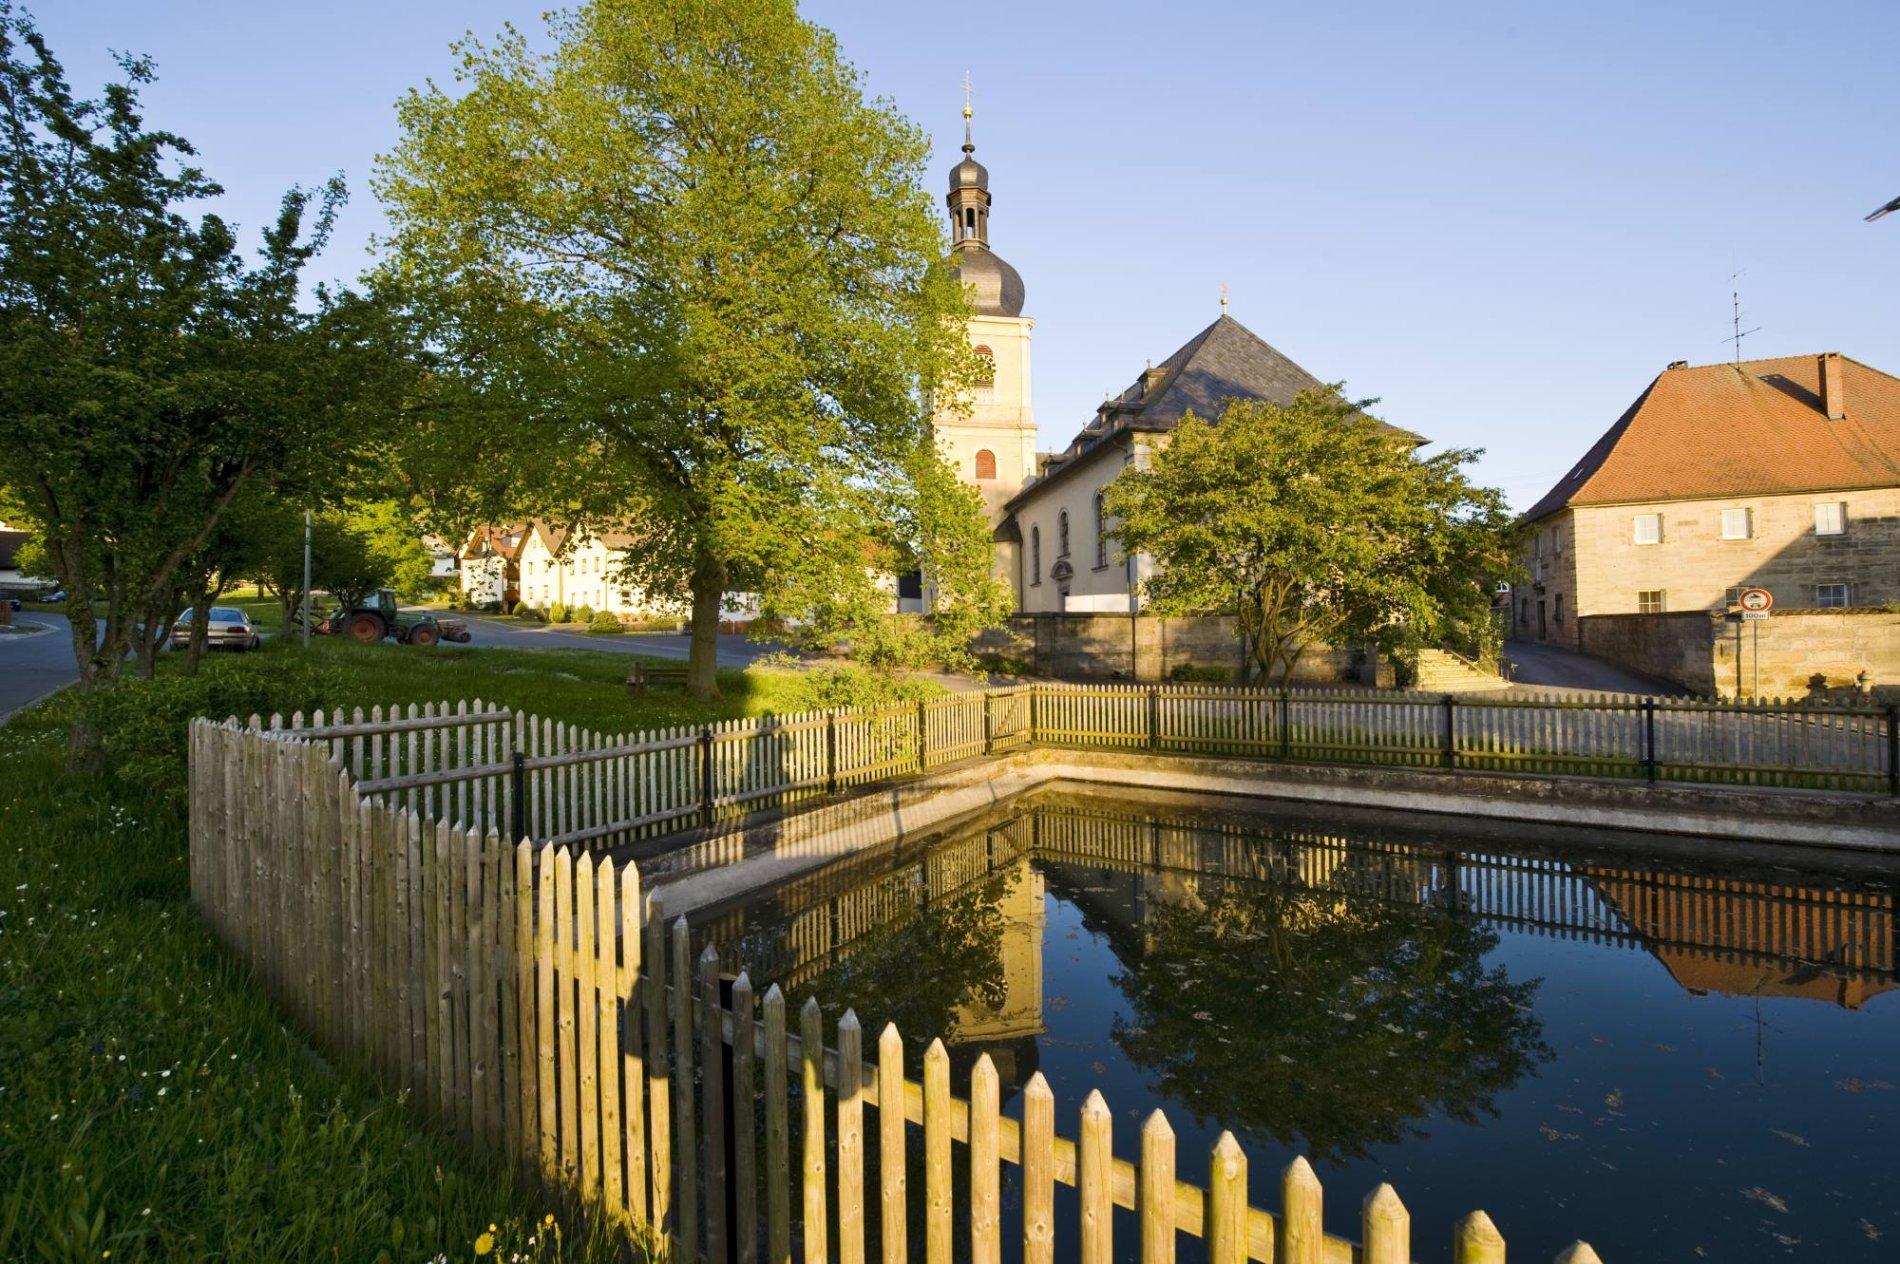 Wallfahrtskirche Glosberg